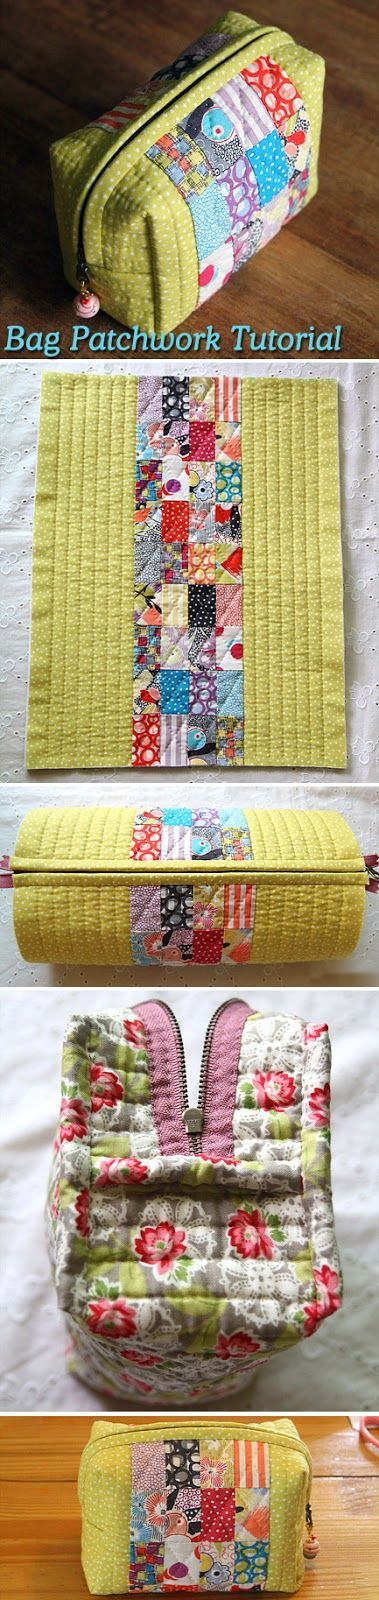 Bag #Patchwork #Tutorial #Clutch #diy #sew #sewing | #Täschchen ...